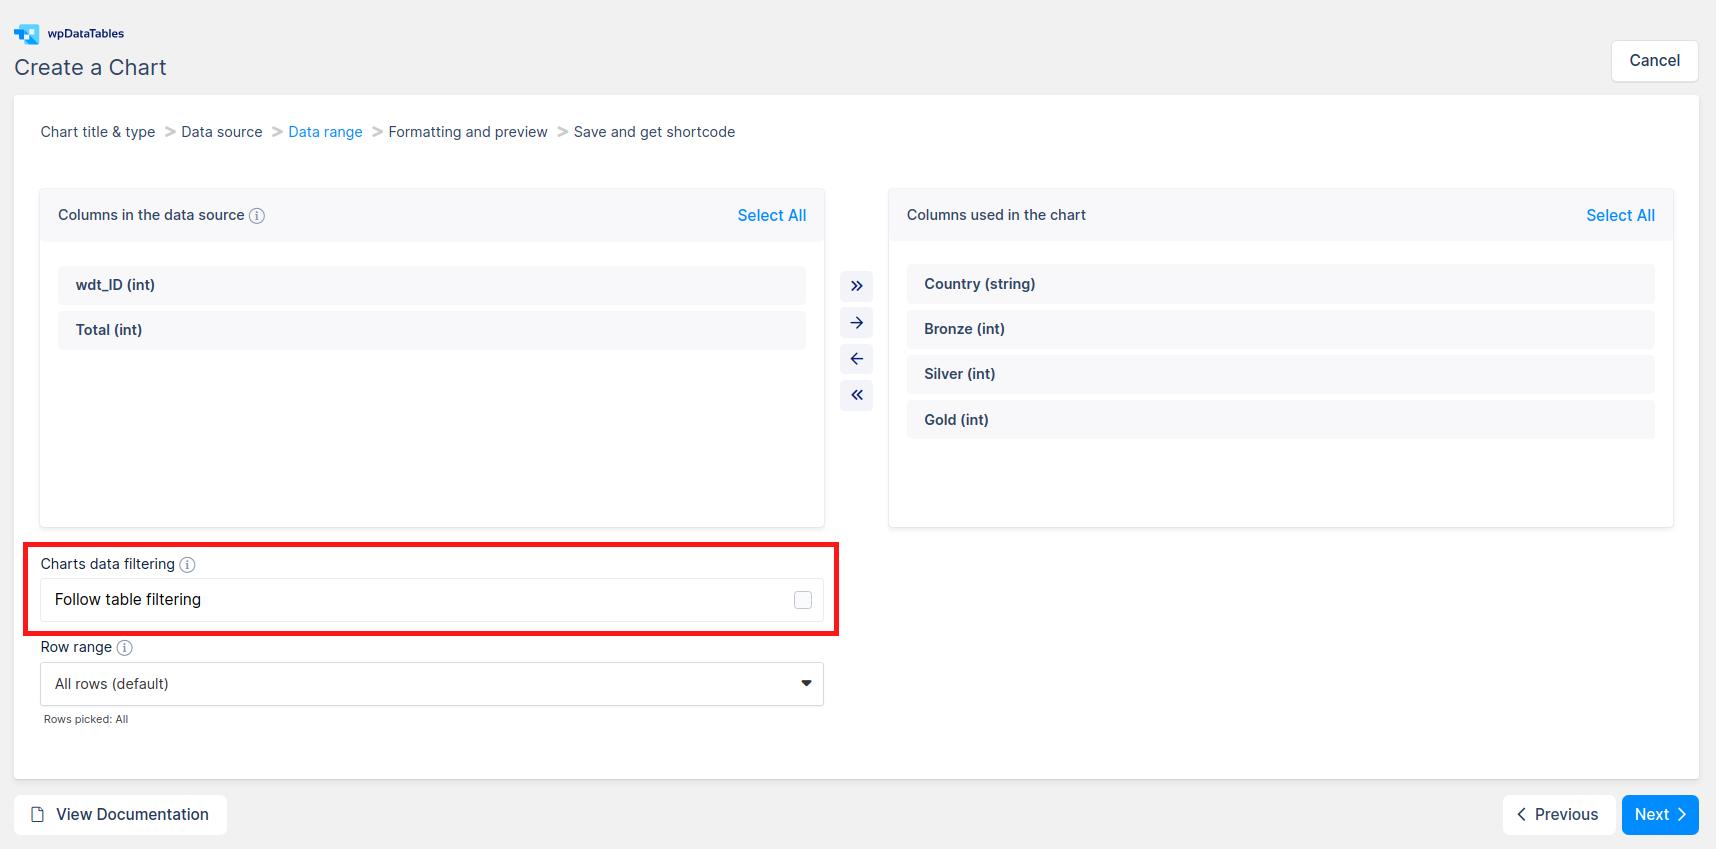 Folow table filtering in WordPress charts